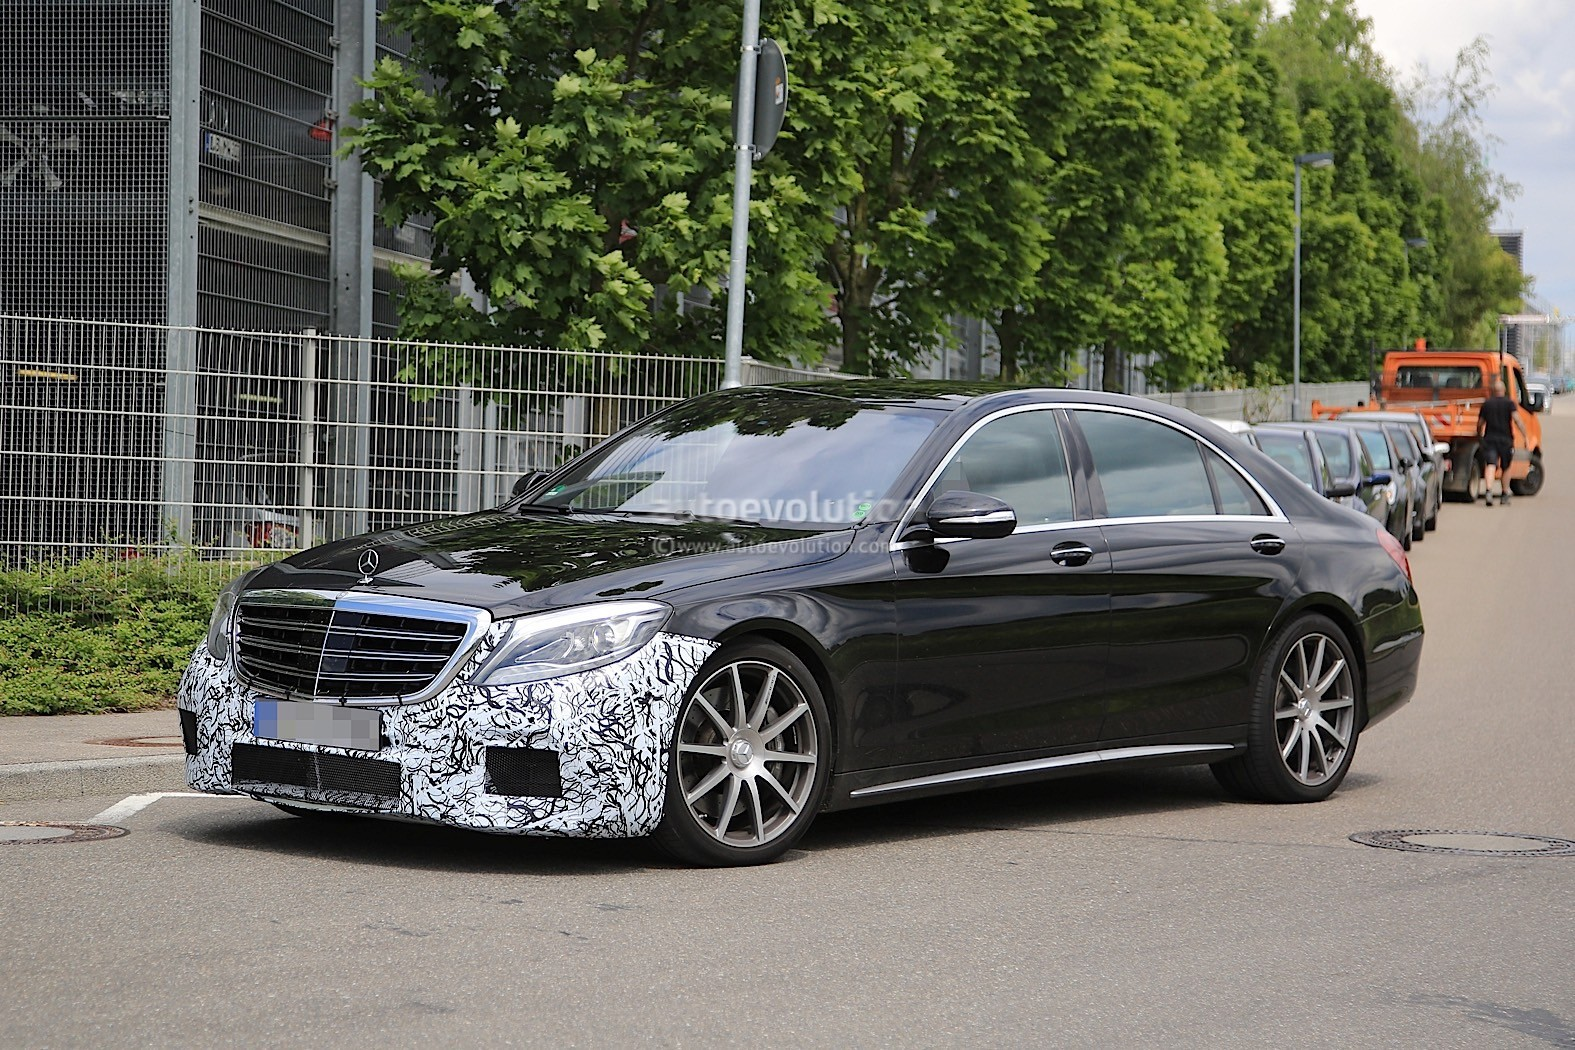 2018 Mercedes-AMG S63 Facelift Lurks Menacing in Latest ...